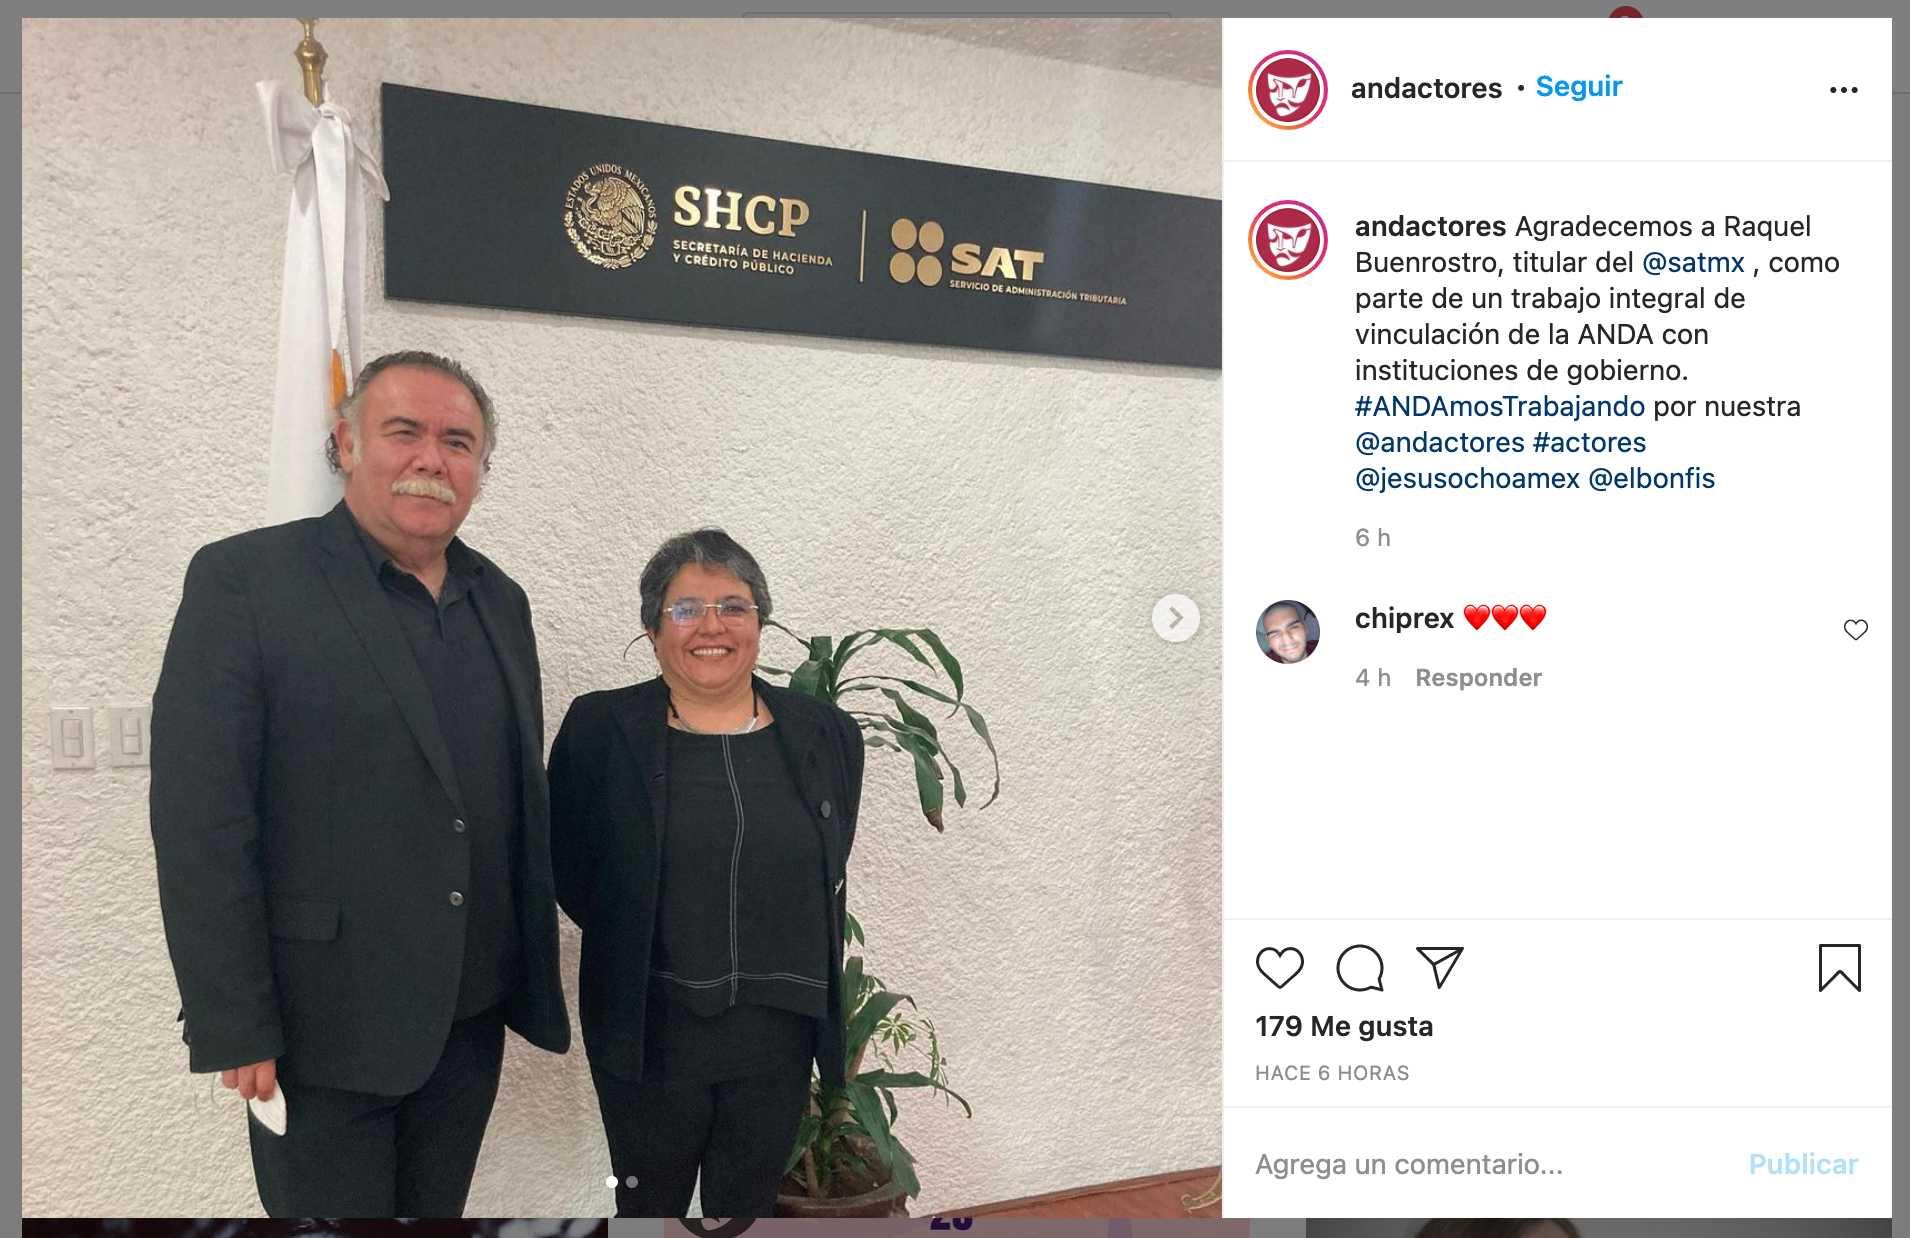 Jesús Ochoa se reune con Raquel Buenrostro del SAT